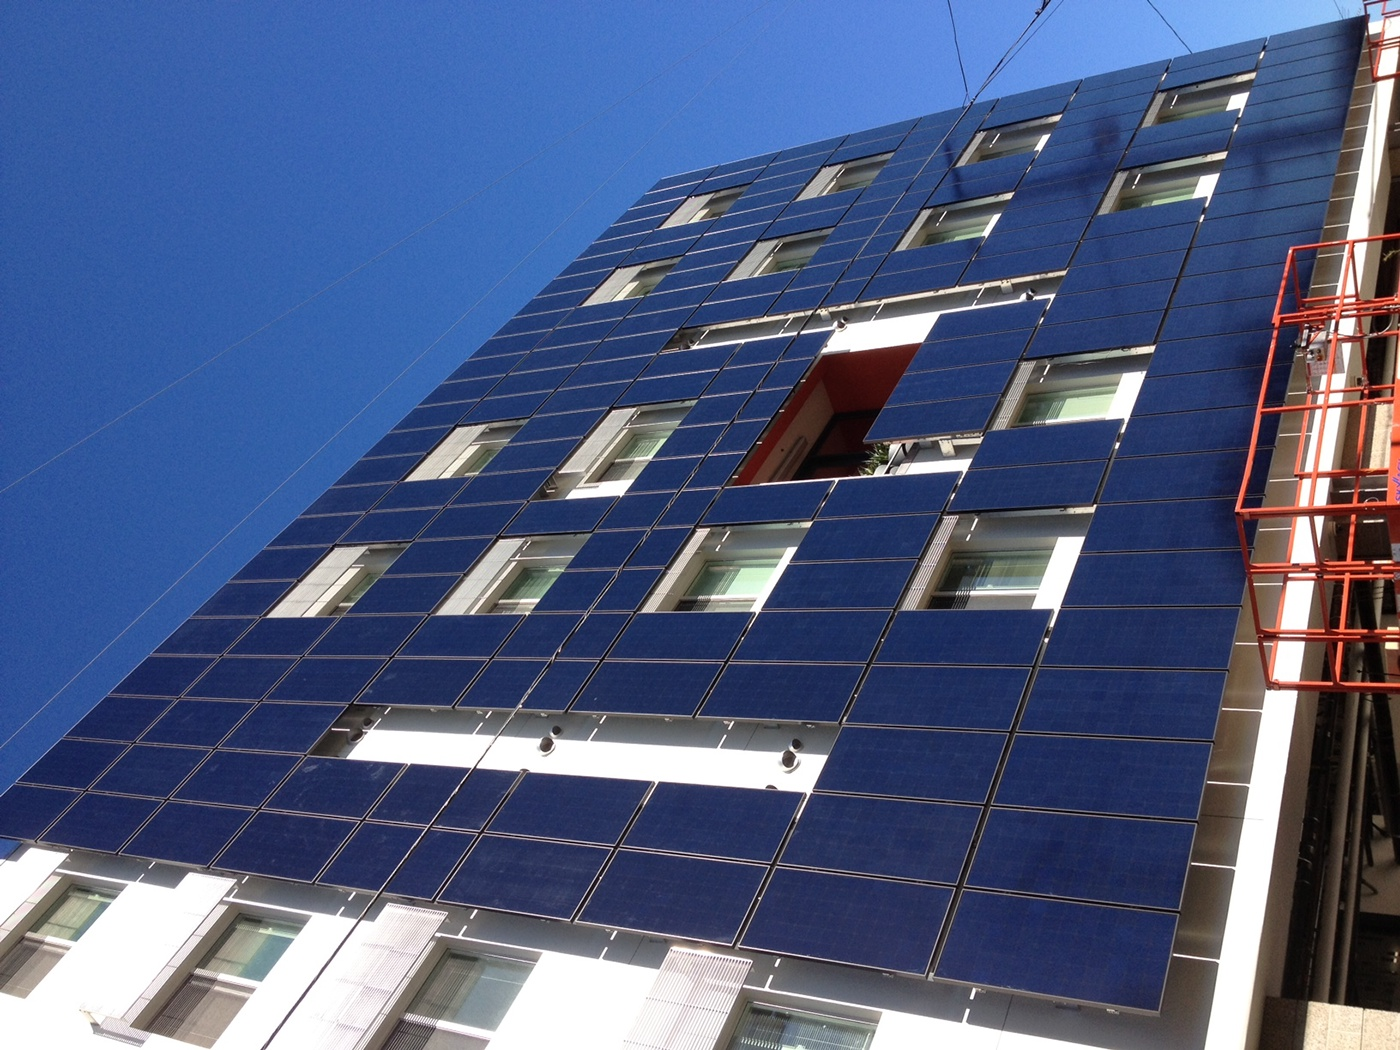 28th Street Apartments BIPV Facade on Behance